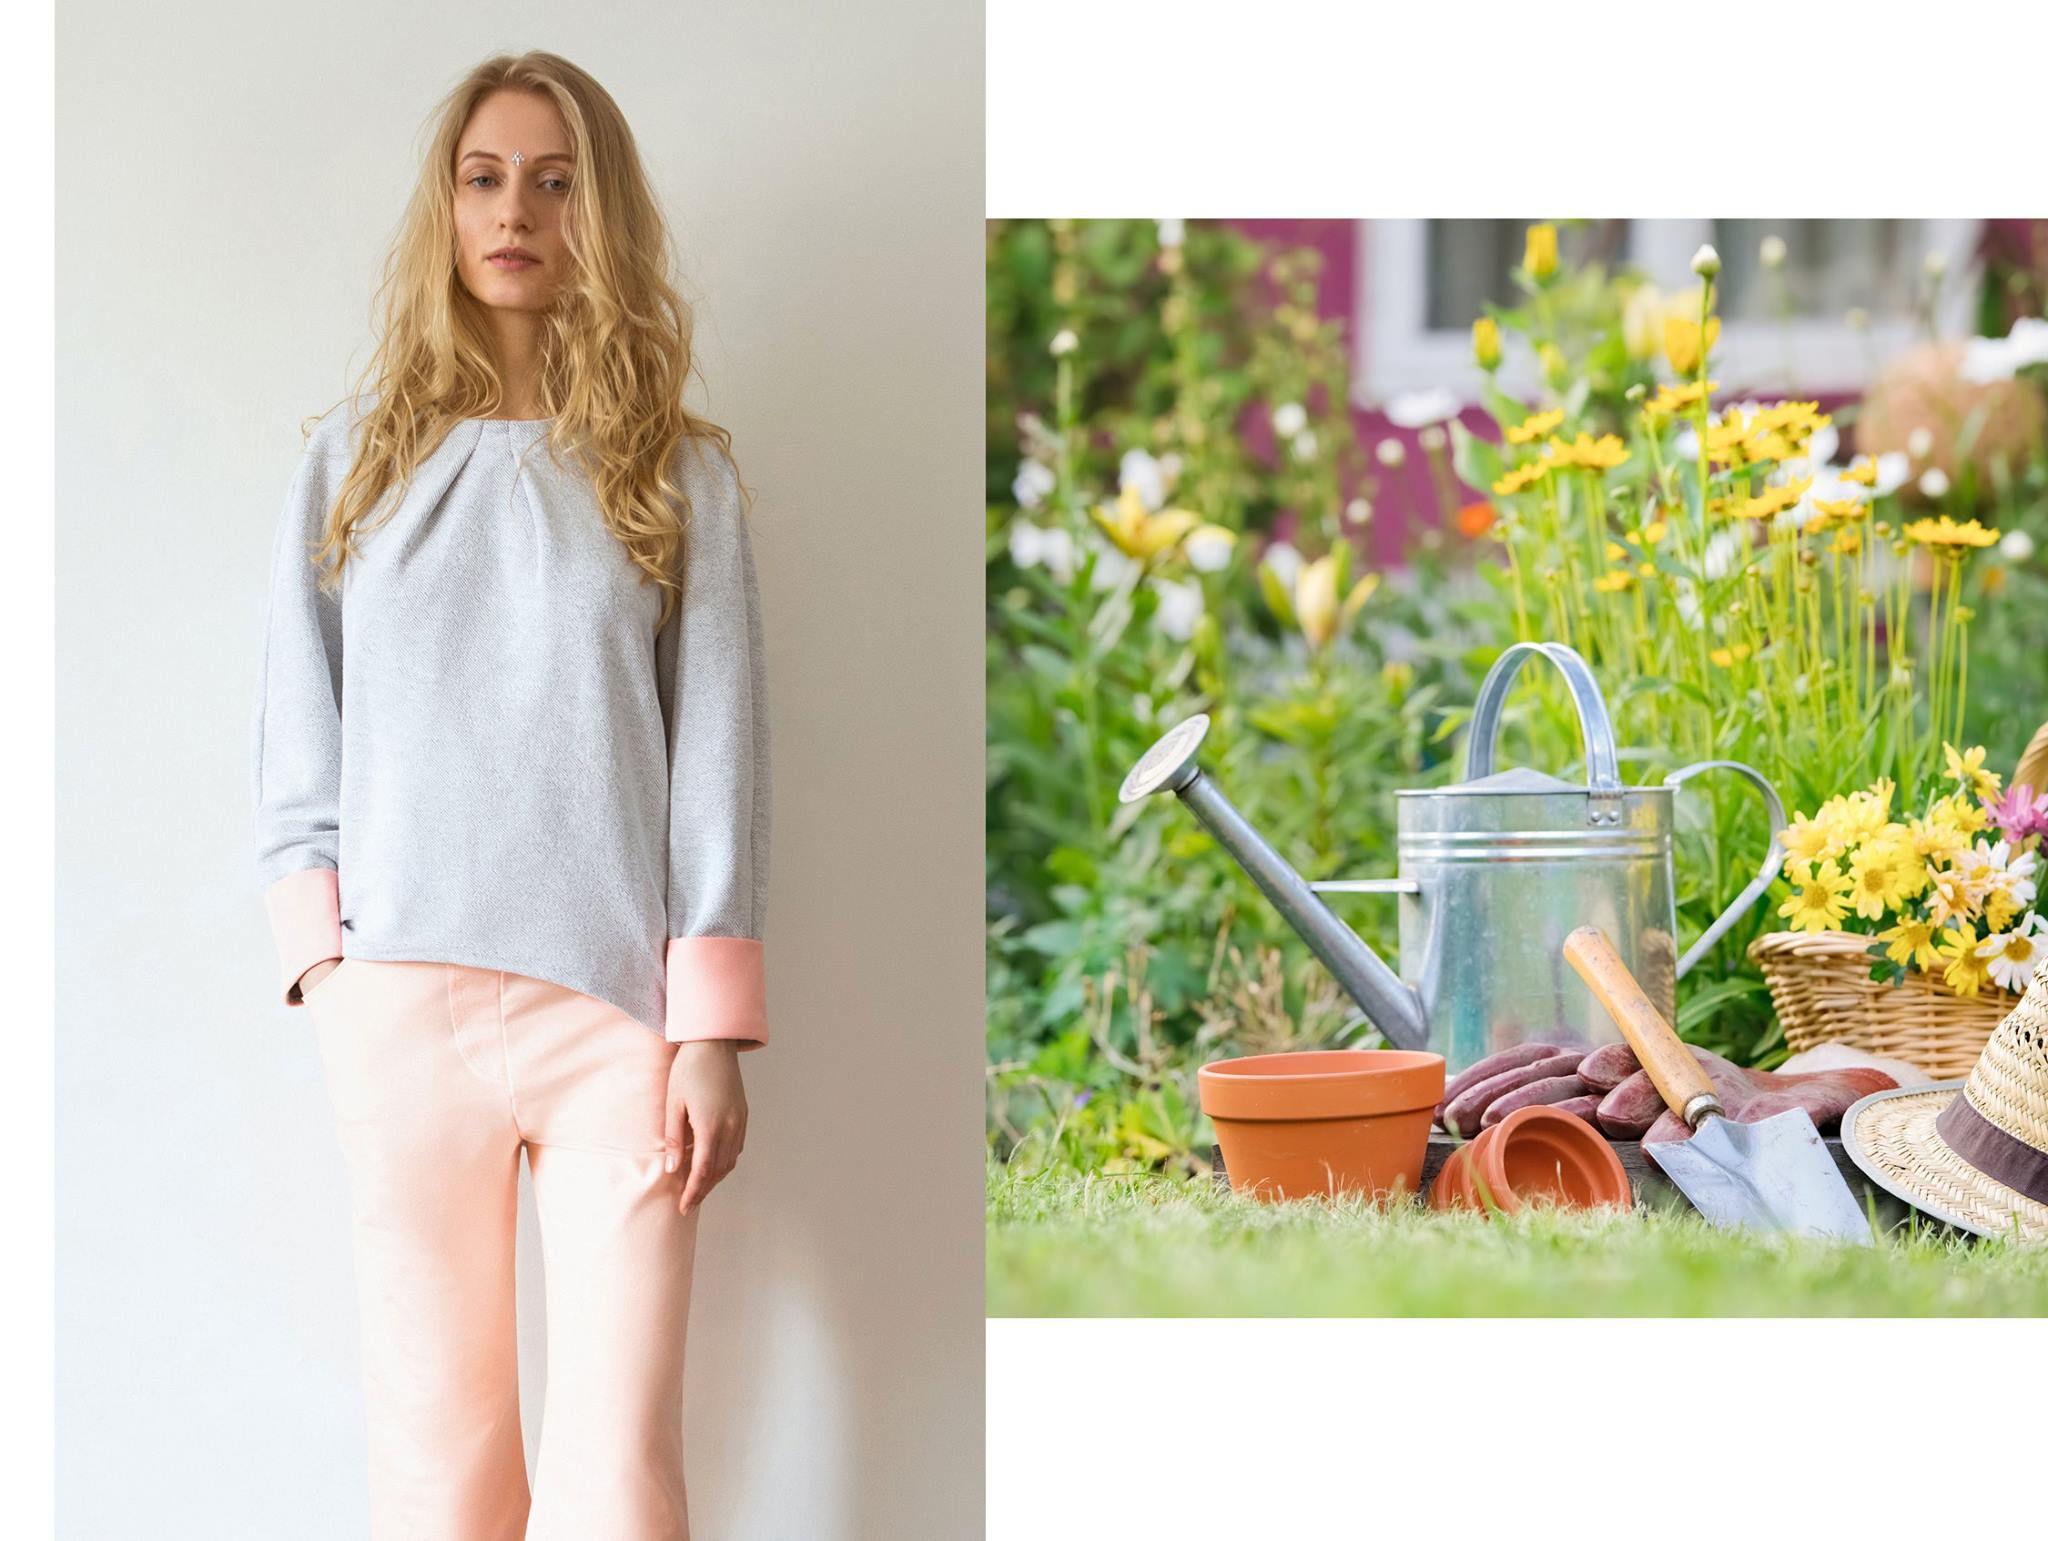 fashion clothes gray sweatshirt pink